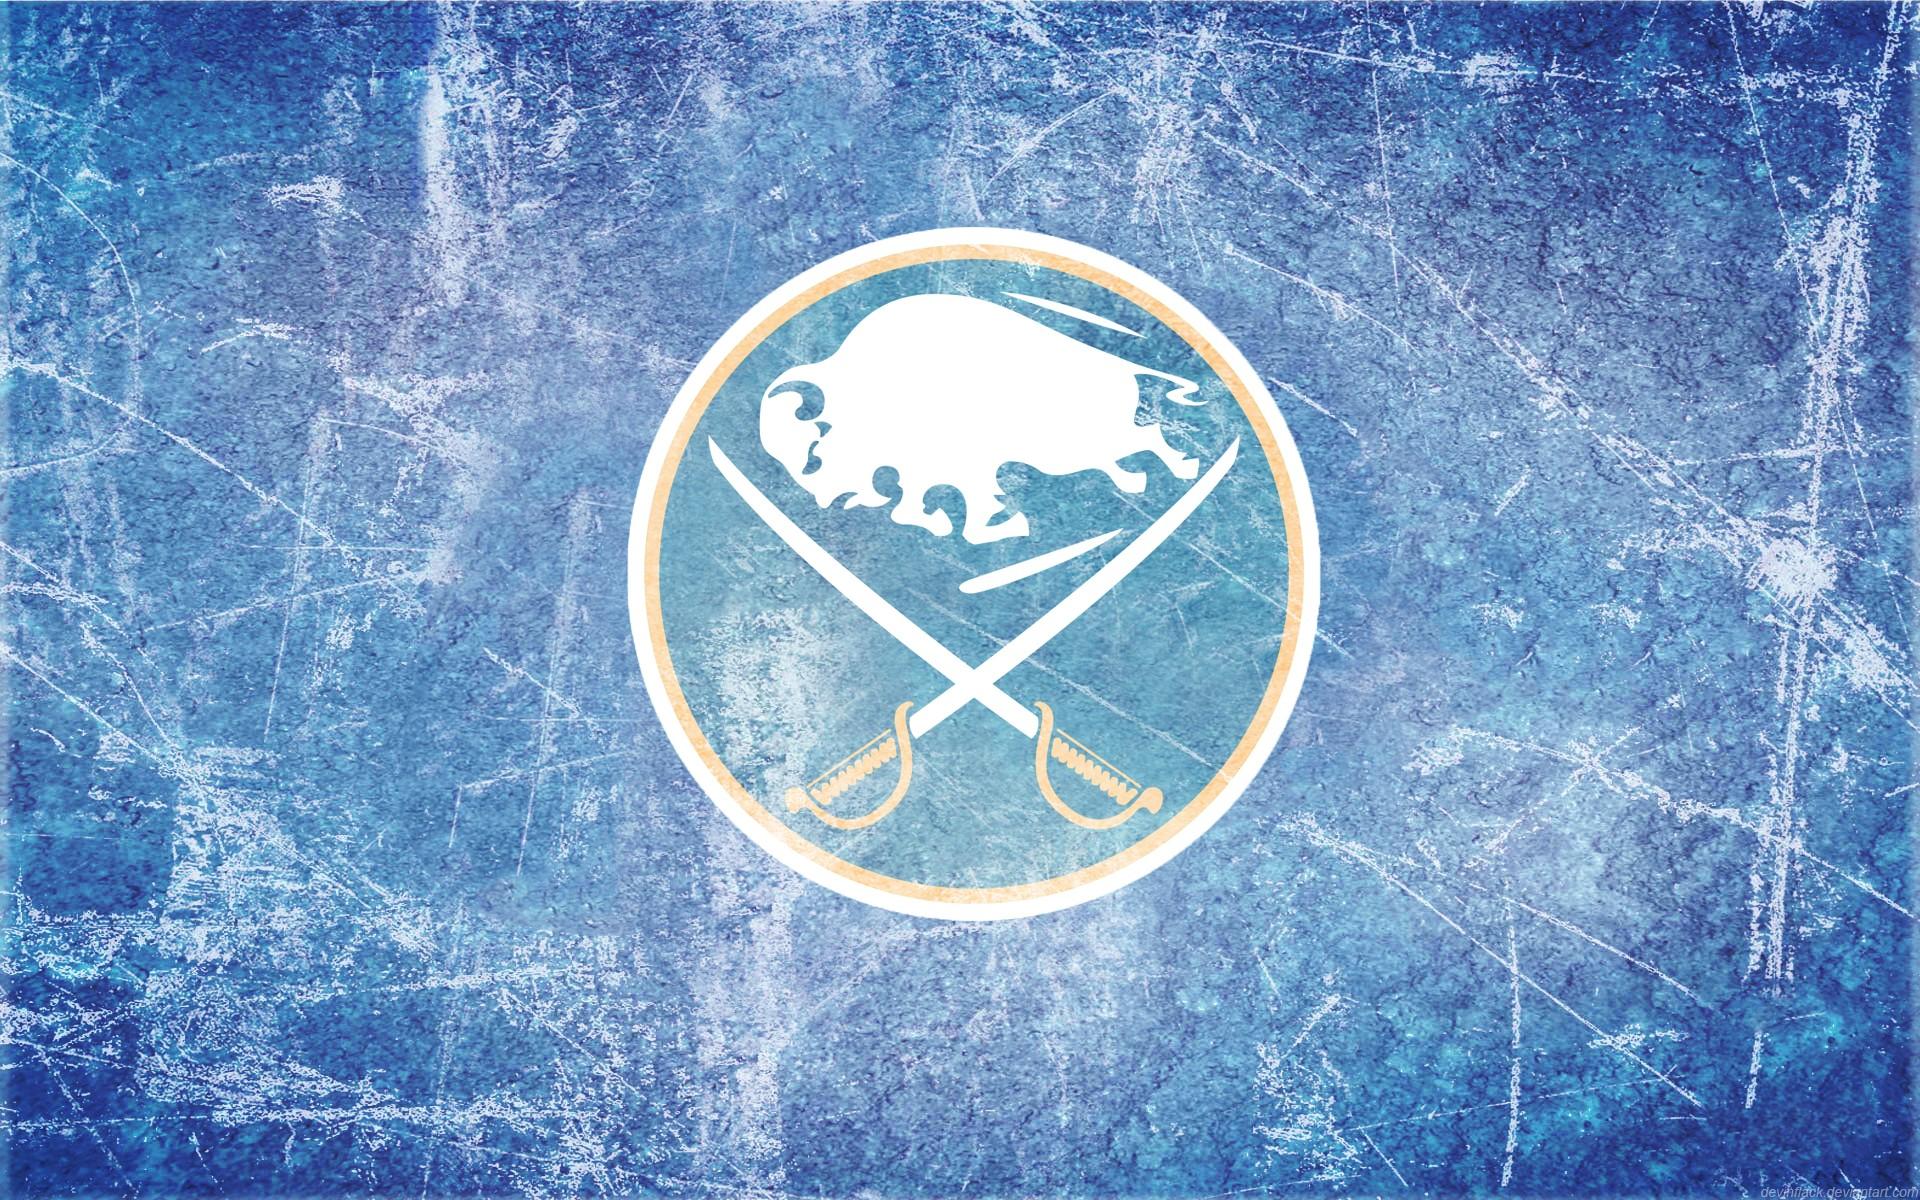 Buffalo Sabres Wallpaper 12   1920 X 1200 stmednet 1920x1200